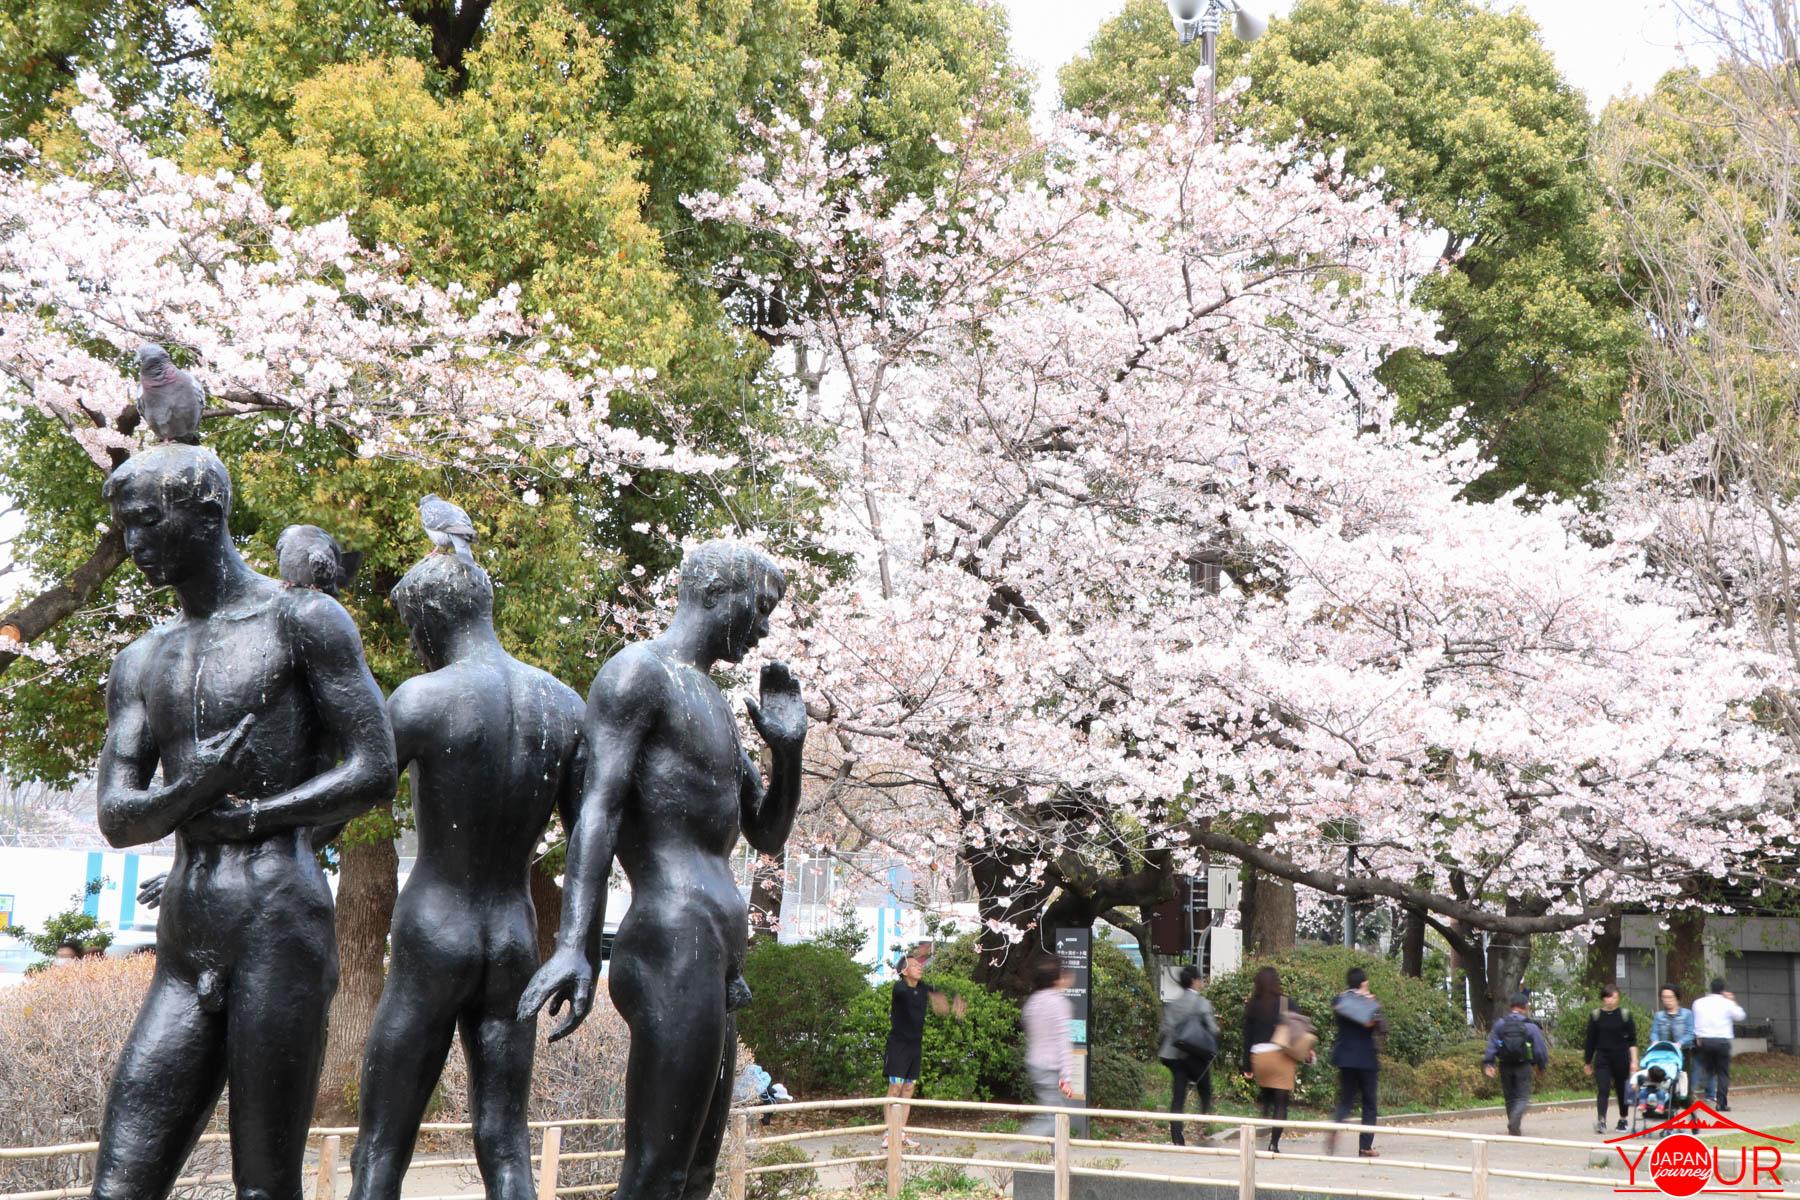 Japan Cherry Blossom Forecast 2021 - Chidorigafuchi Park